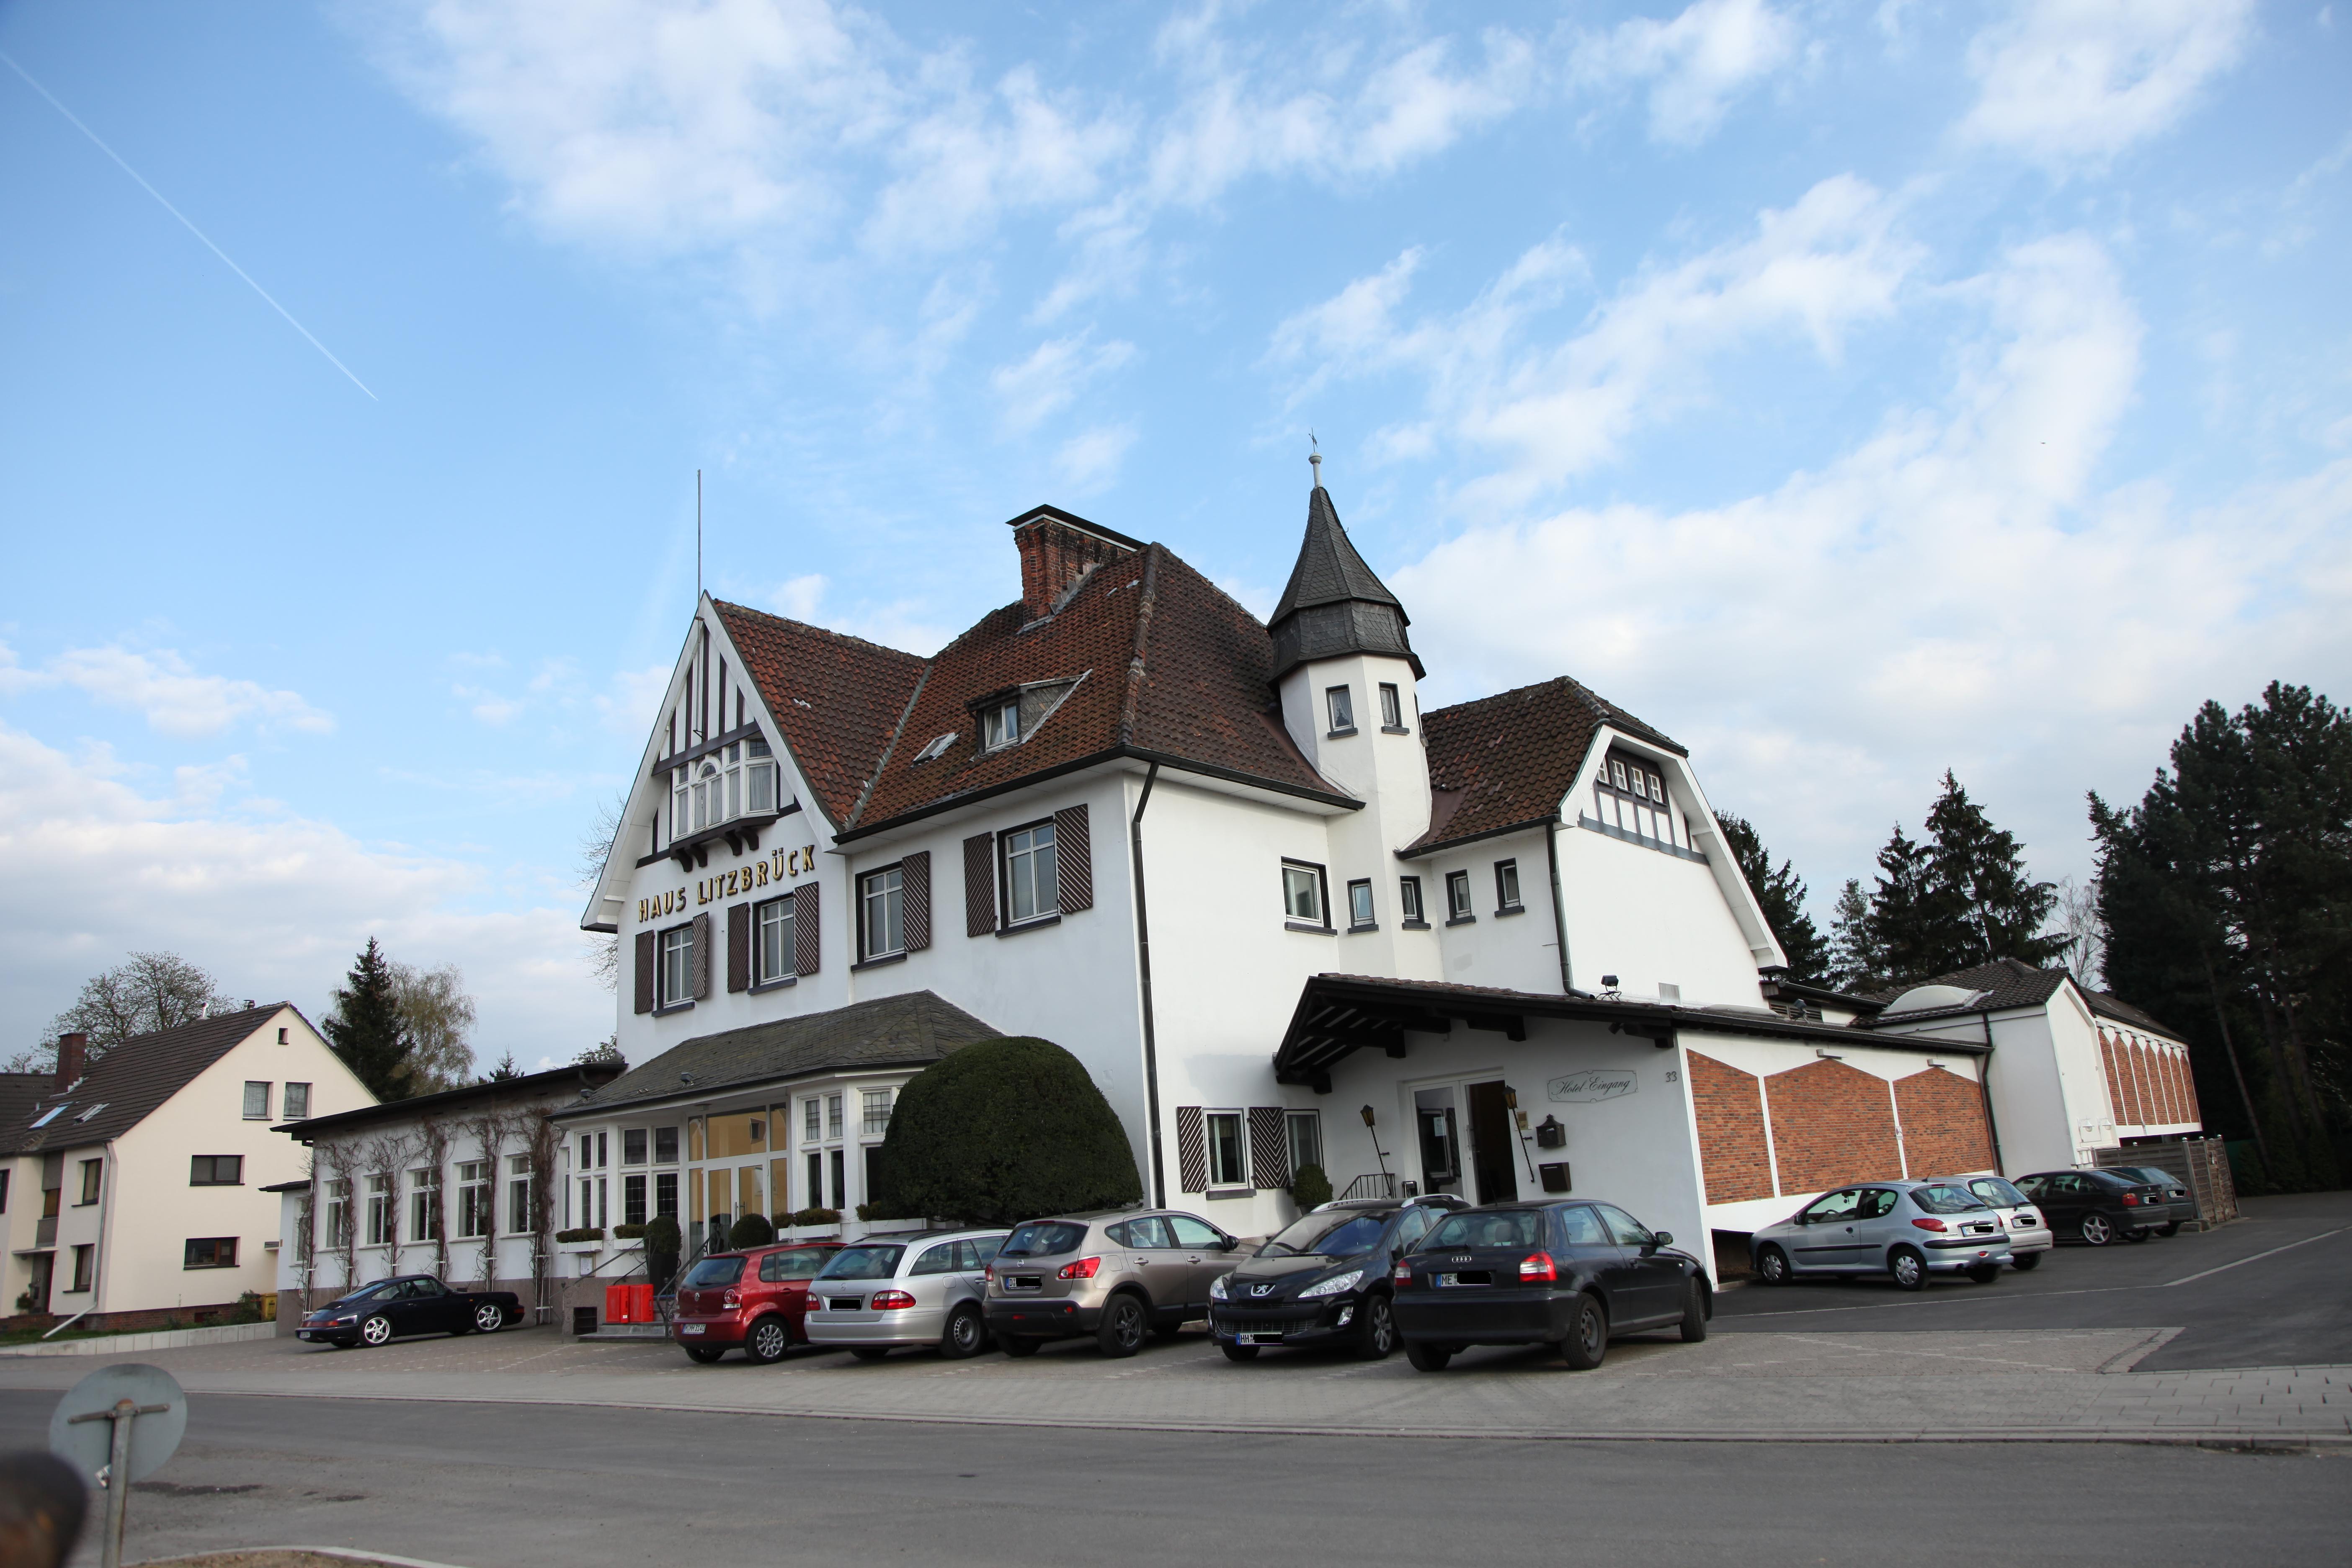 File:Haus Litzbrück 2010 außen.JPG - Wikimedia Commons